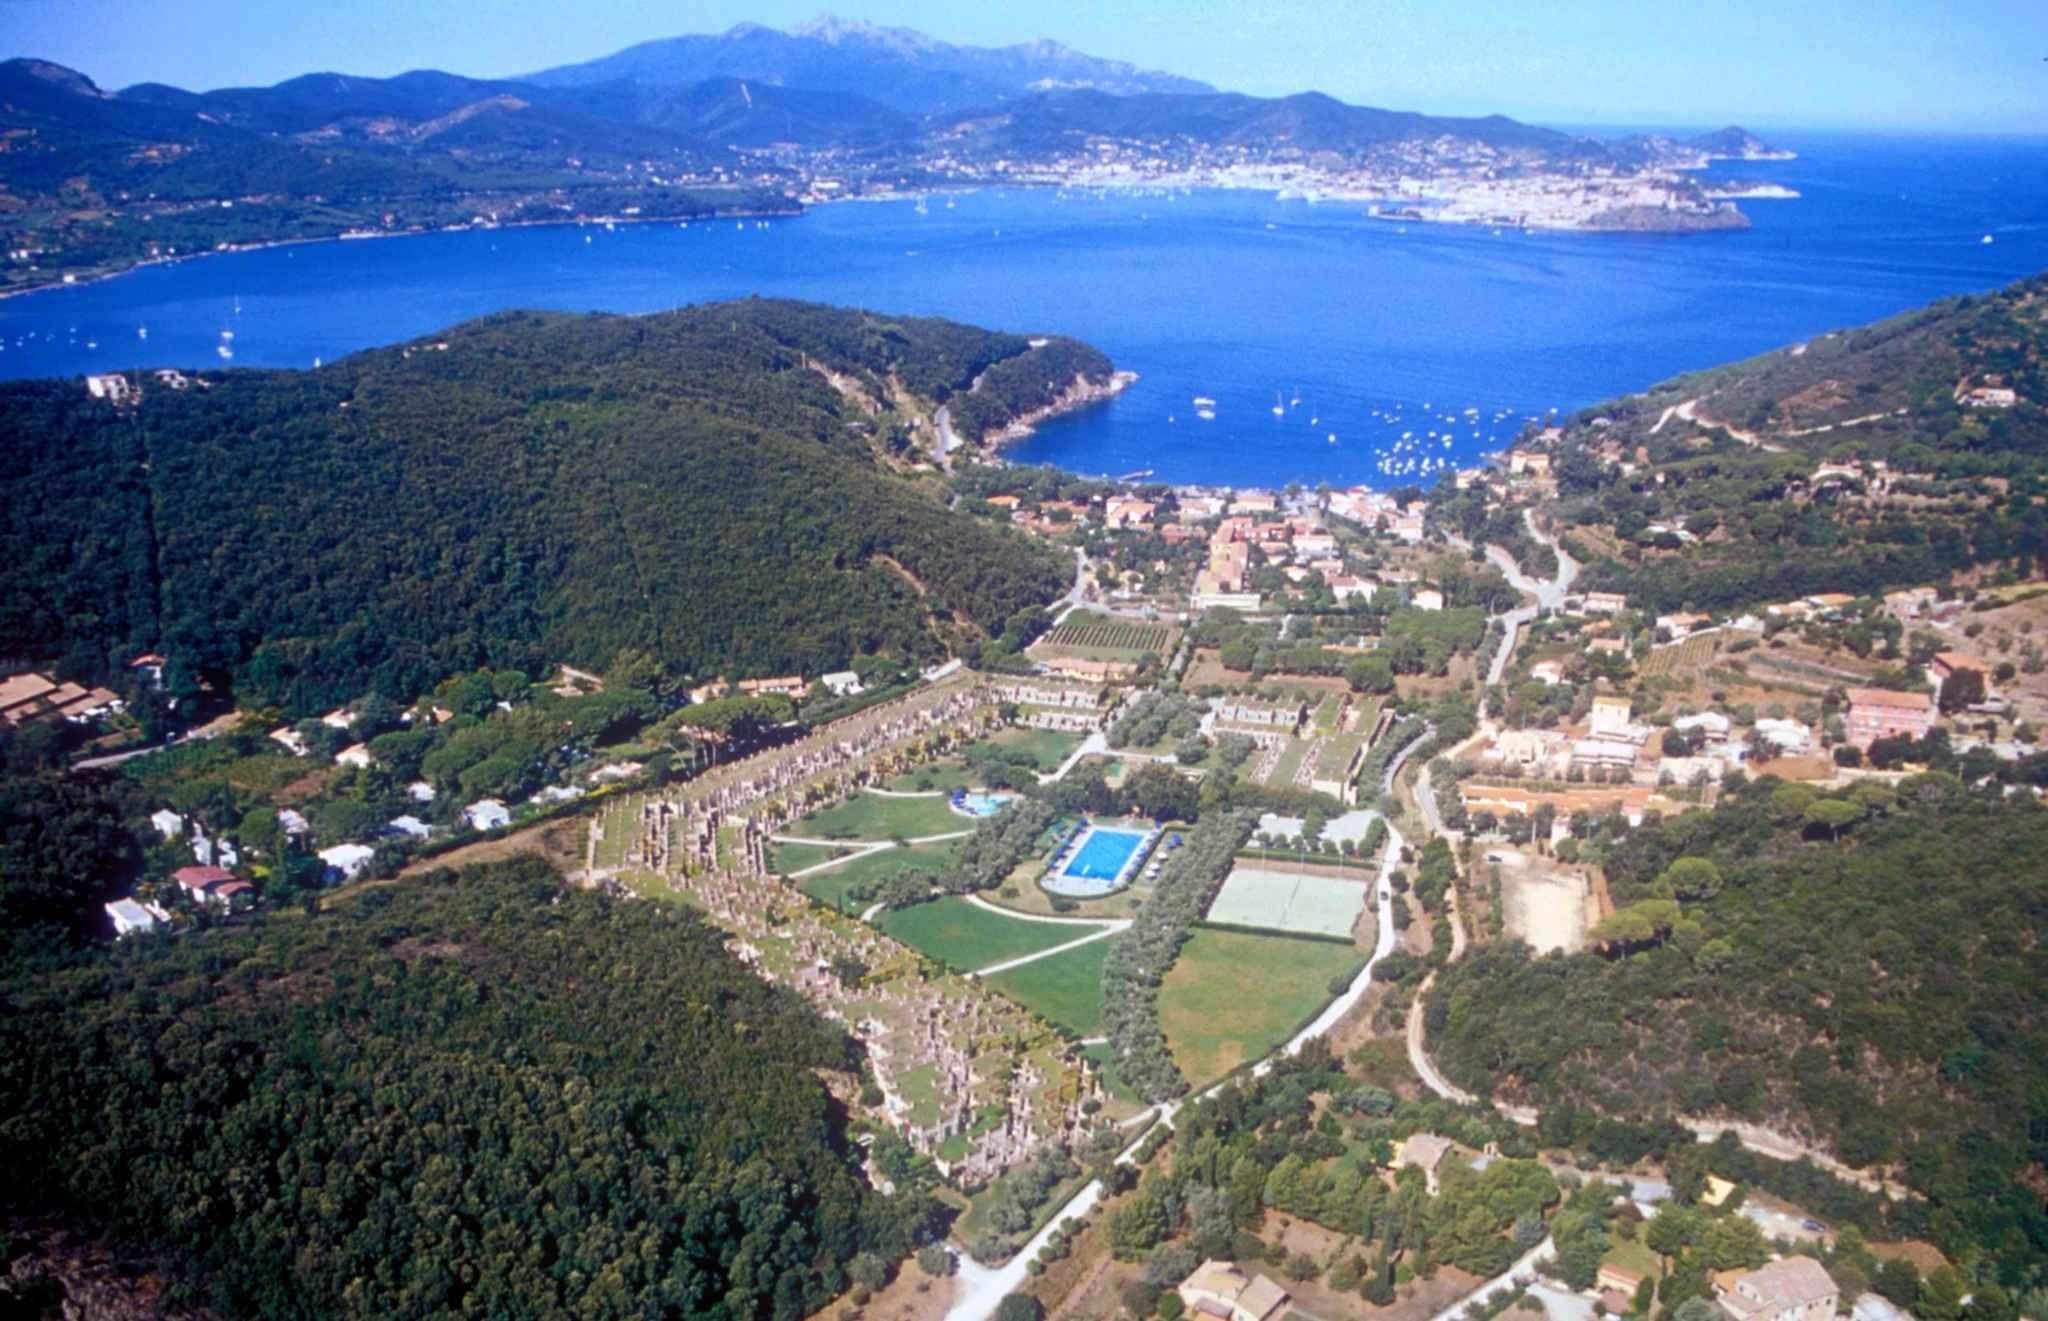 Ferienwohnung Residence Sant'Anna del Volterraio (403209), Rio Nell'Elba, Elba, Toskana, Italien, Bild 4